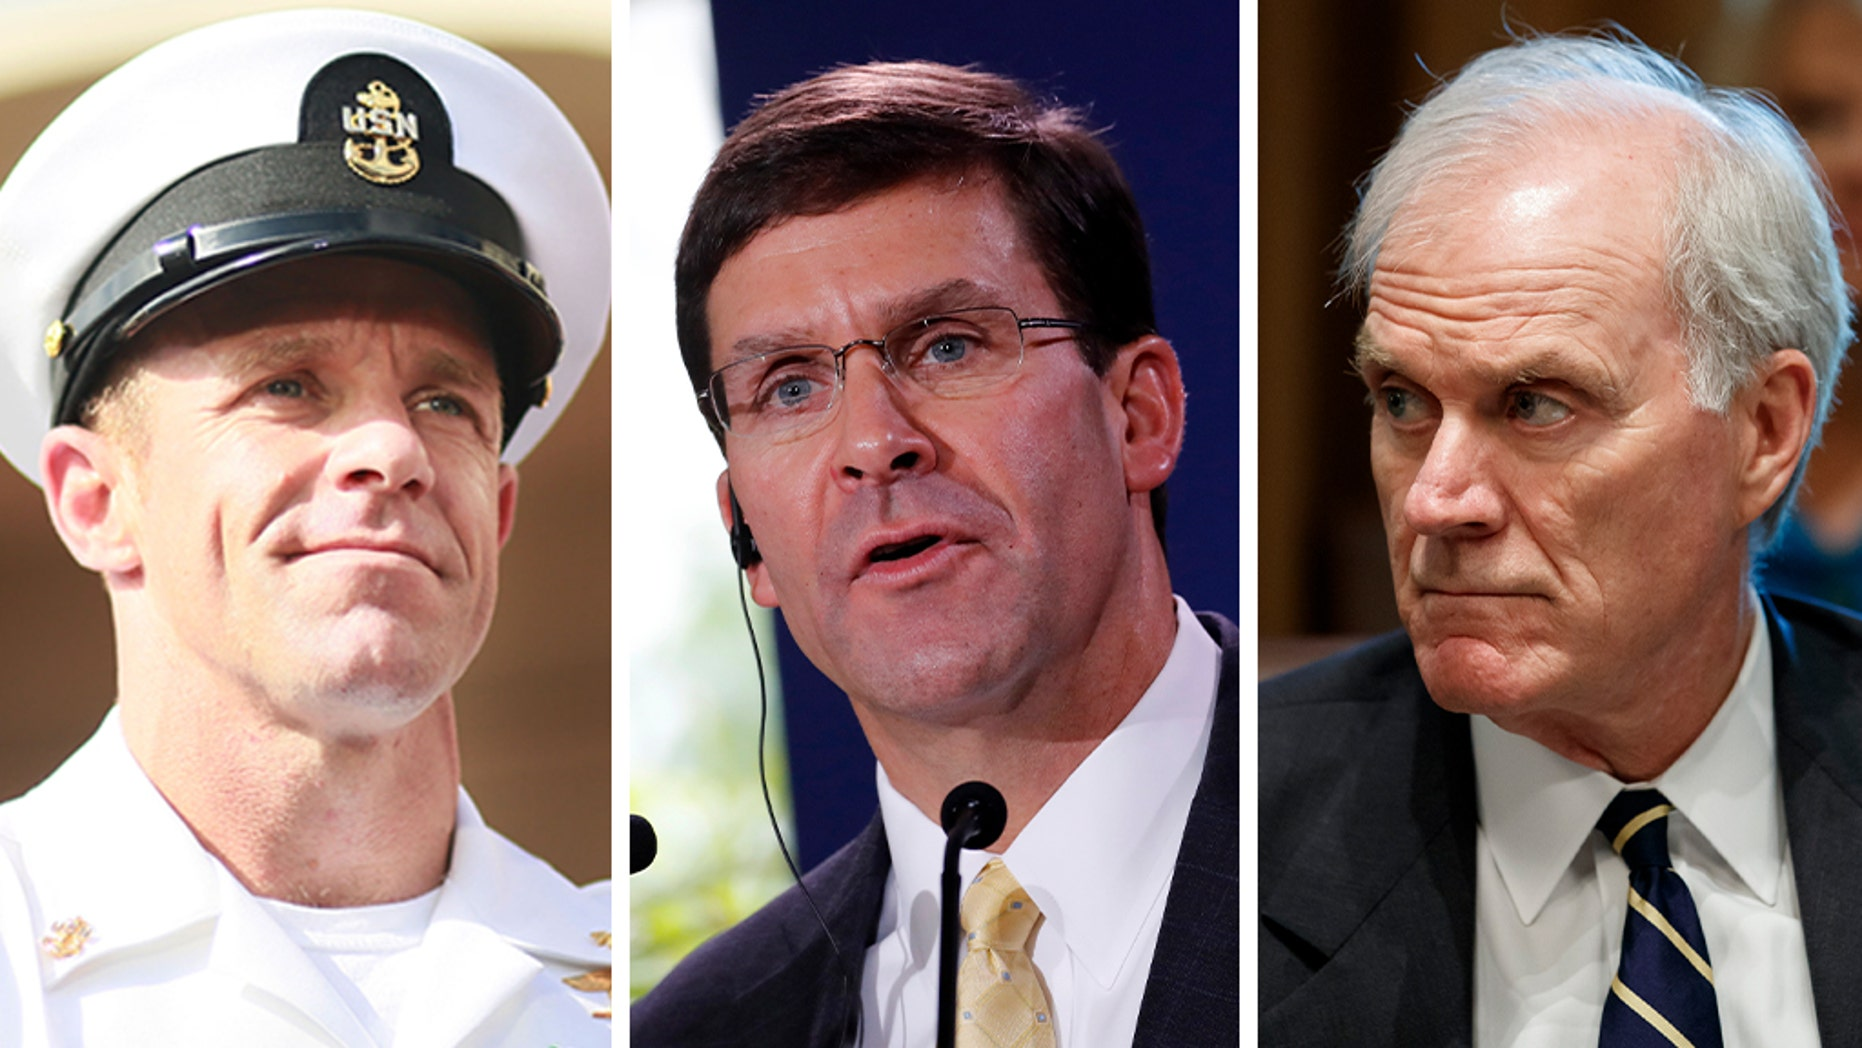 Navy secretary fired over handling of Eddie Gallagher case